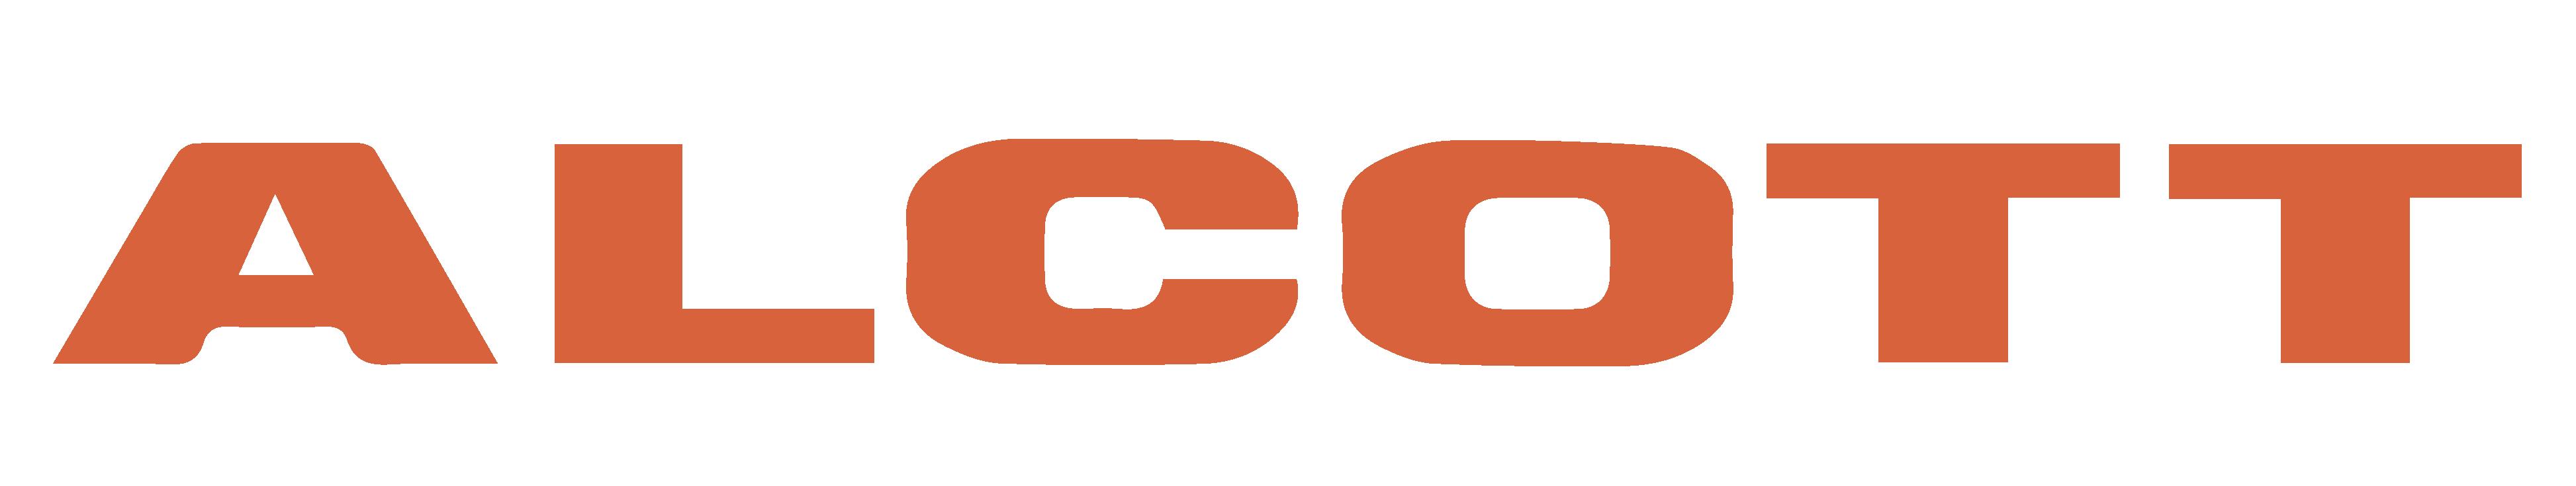 Customer Microlog Retail Alcott